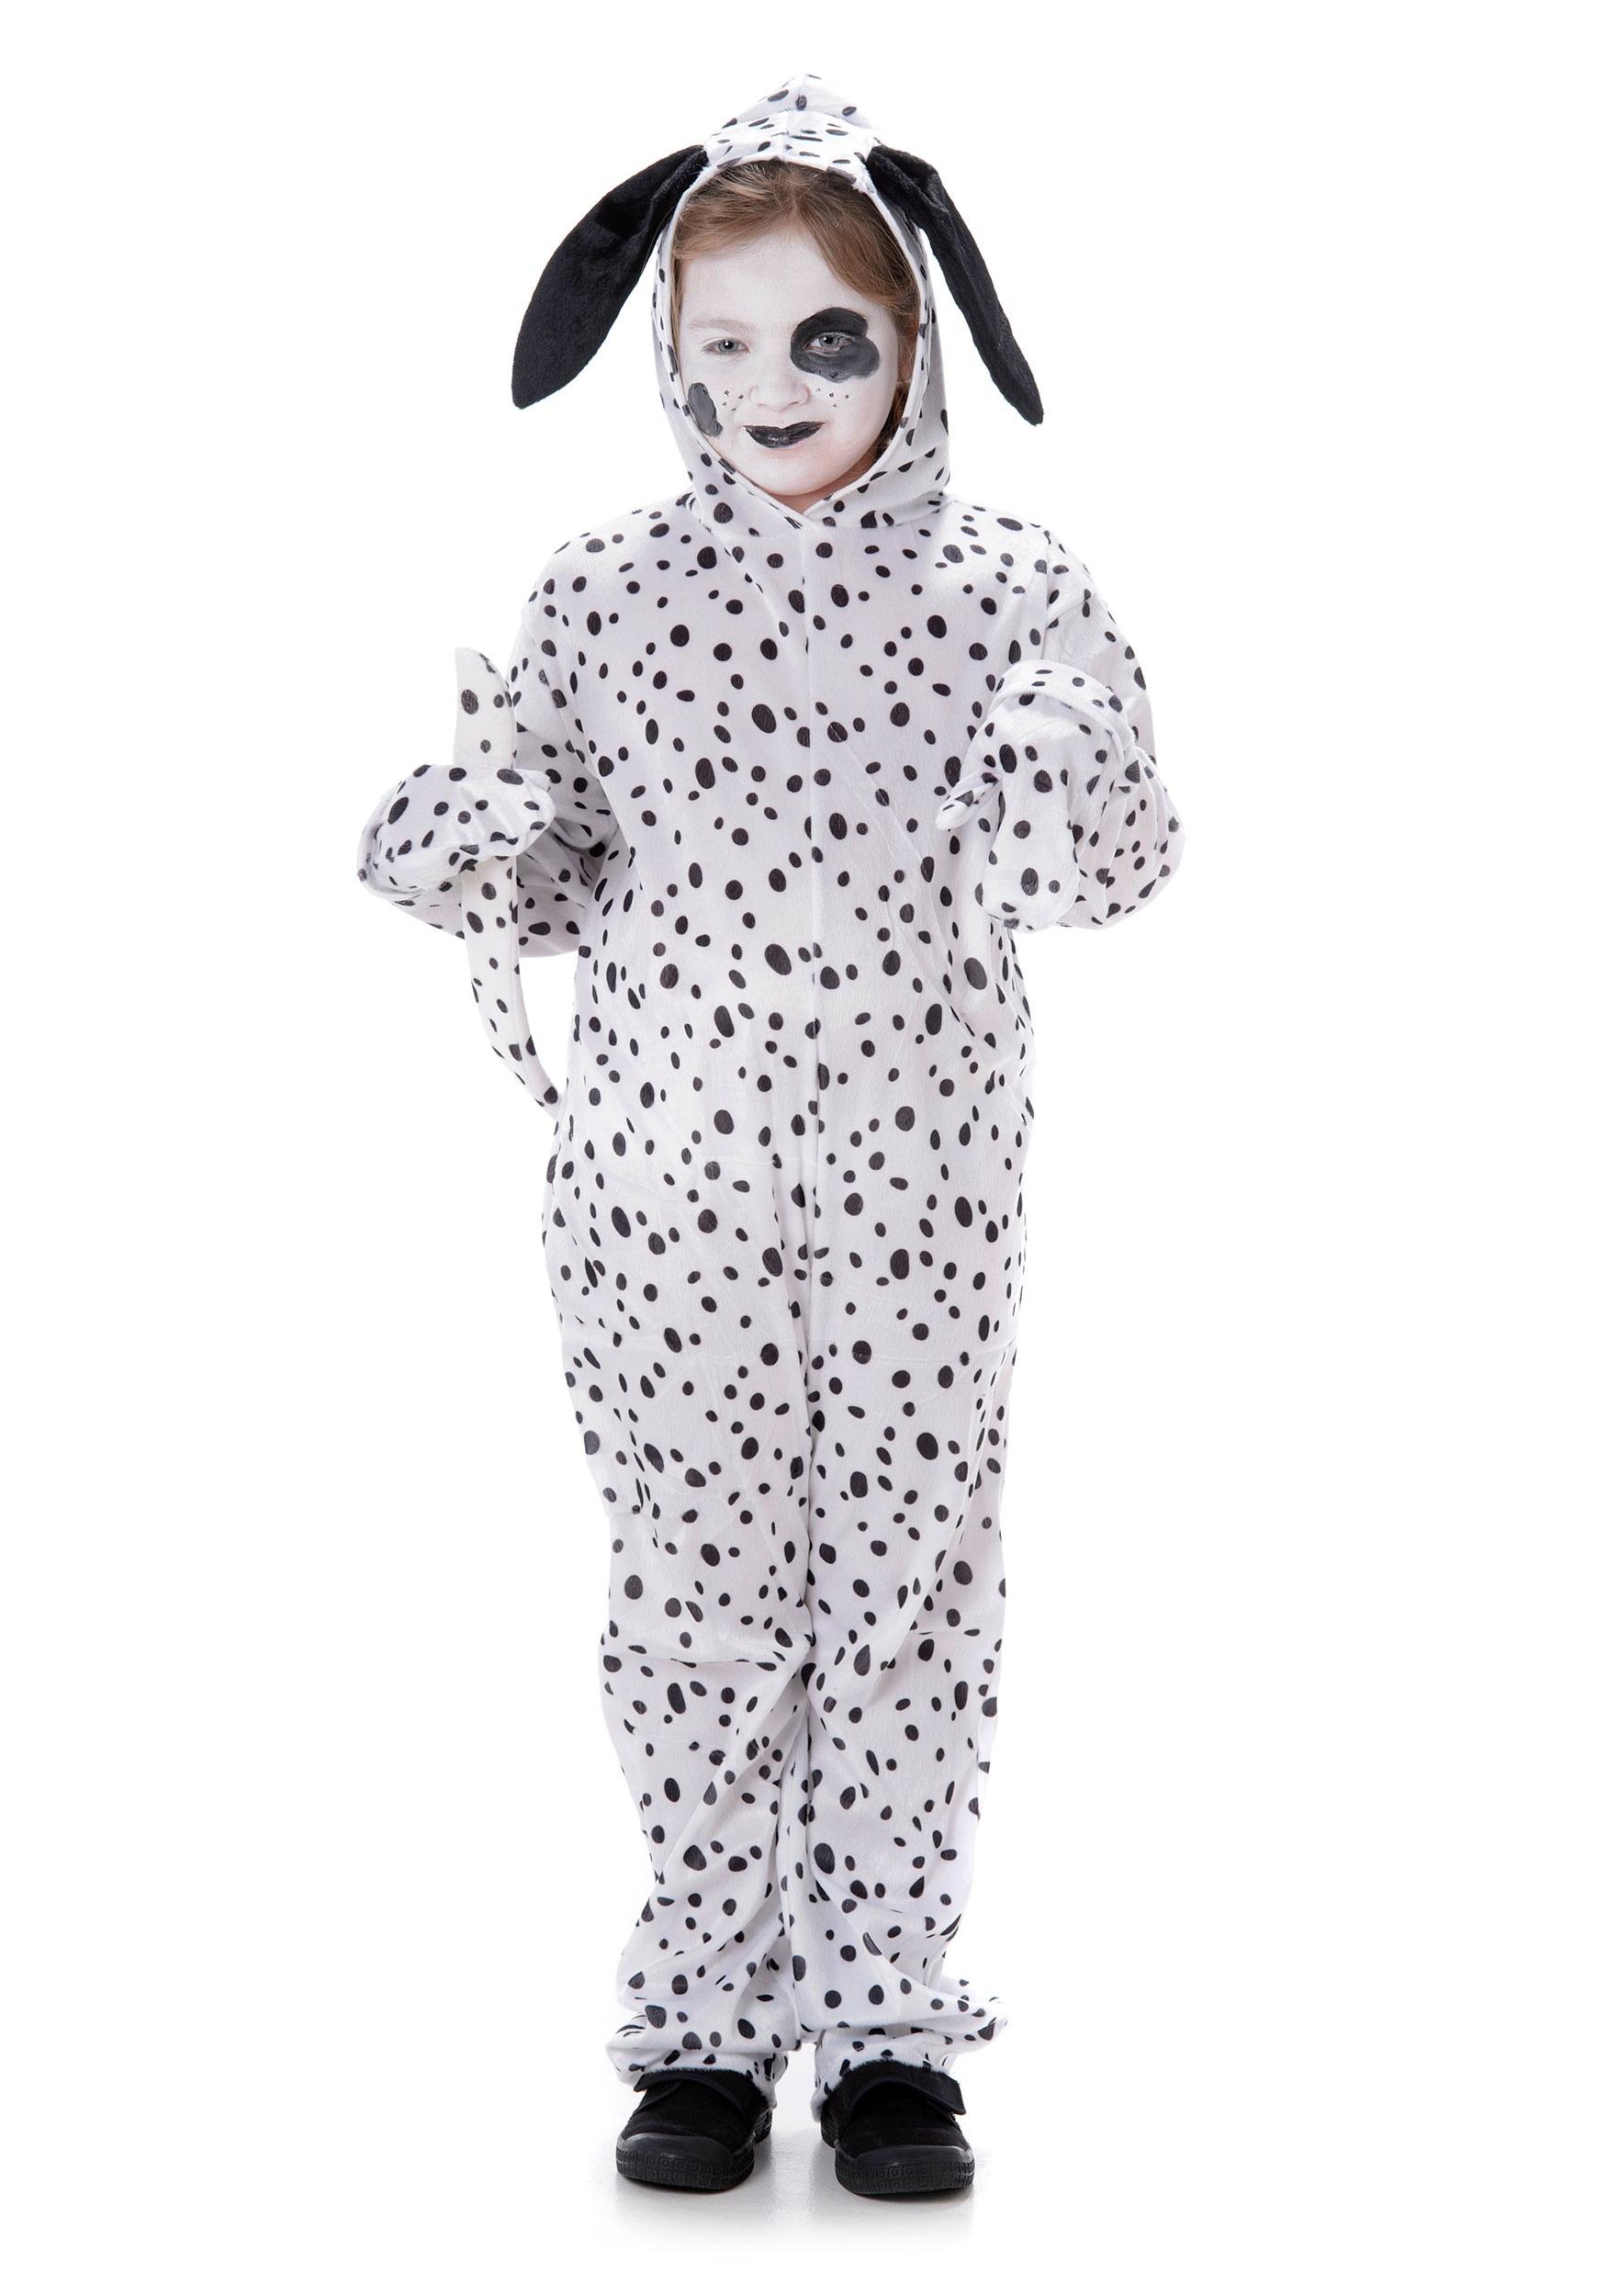 Childu0027s Dalmatian Costume  sc 1 st  Halloween Costumes AU & Childs Dalmatian Costume